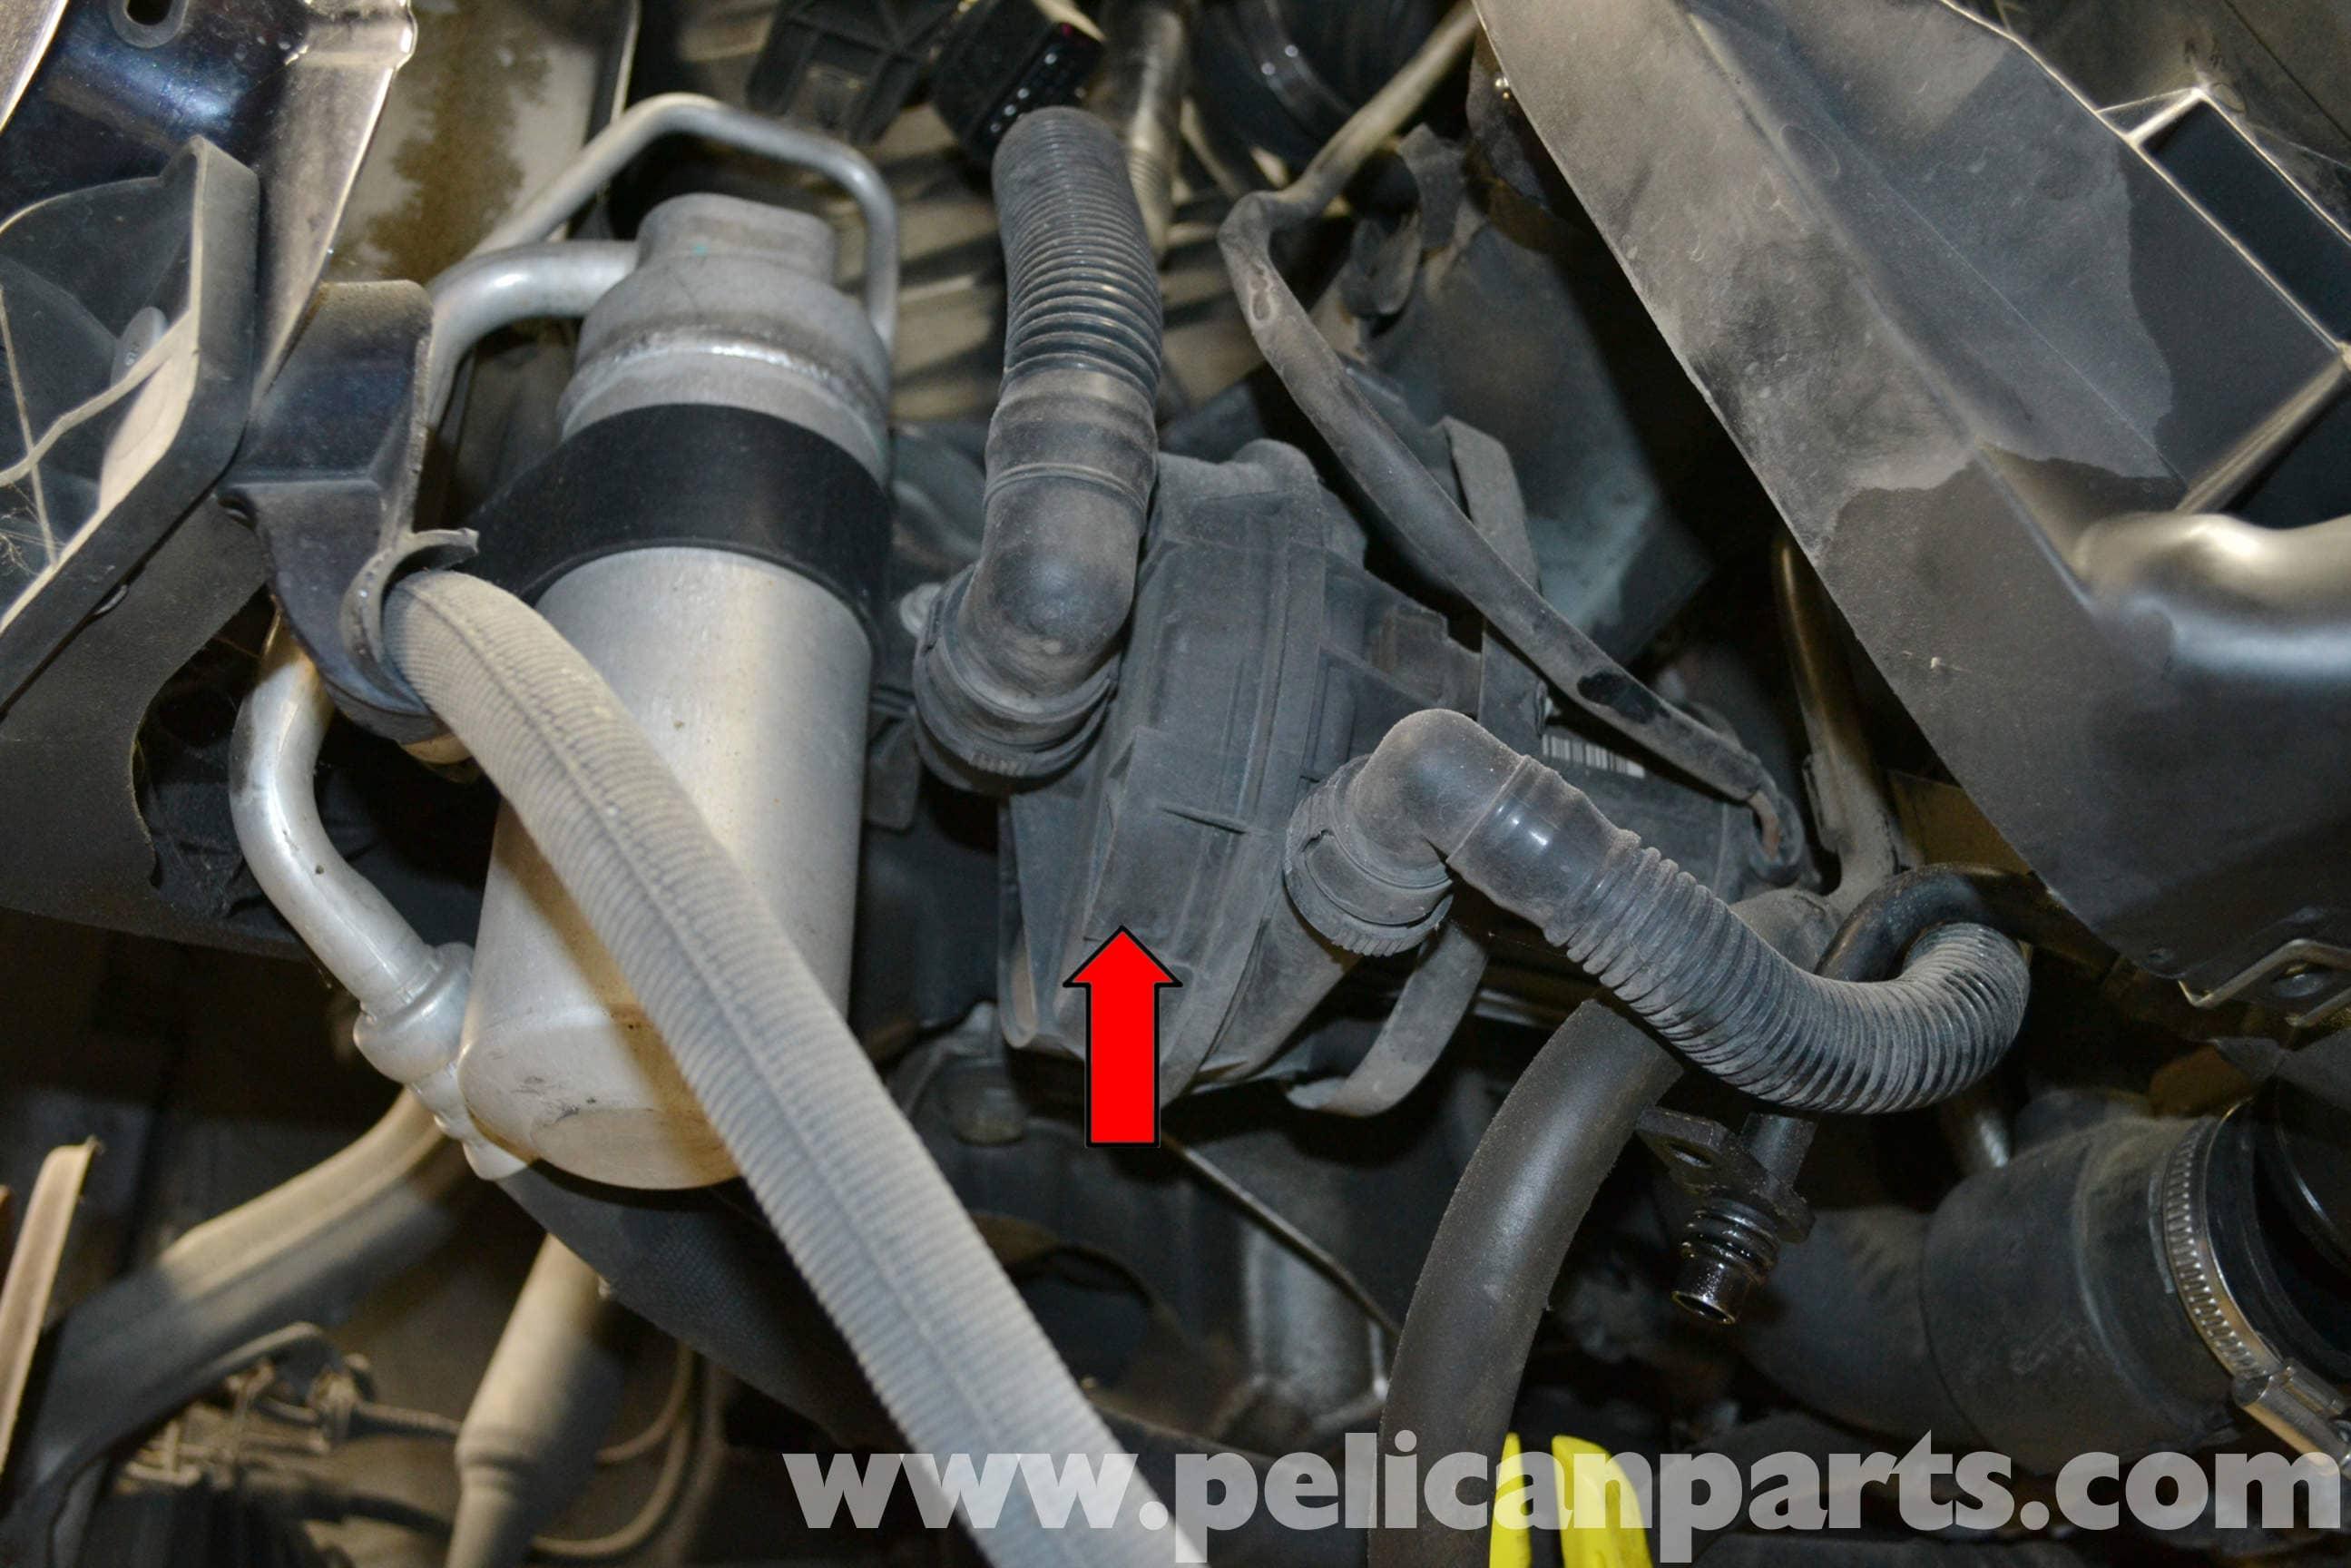 Audi A4 B6 Crankcase Ventilation Egr Hoses And Valve